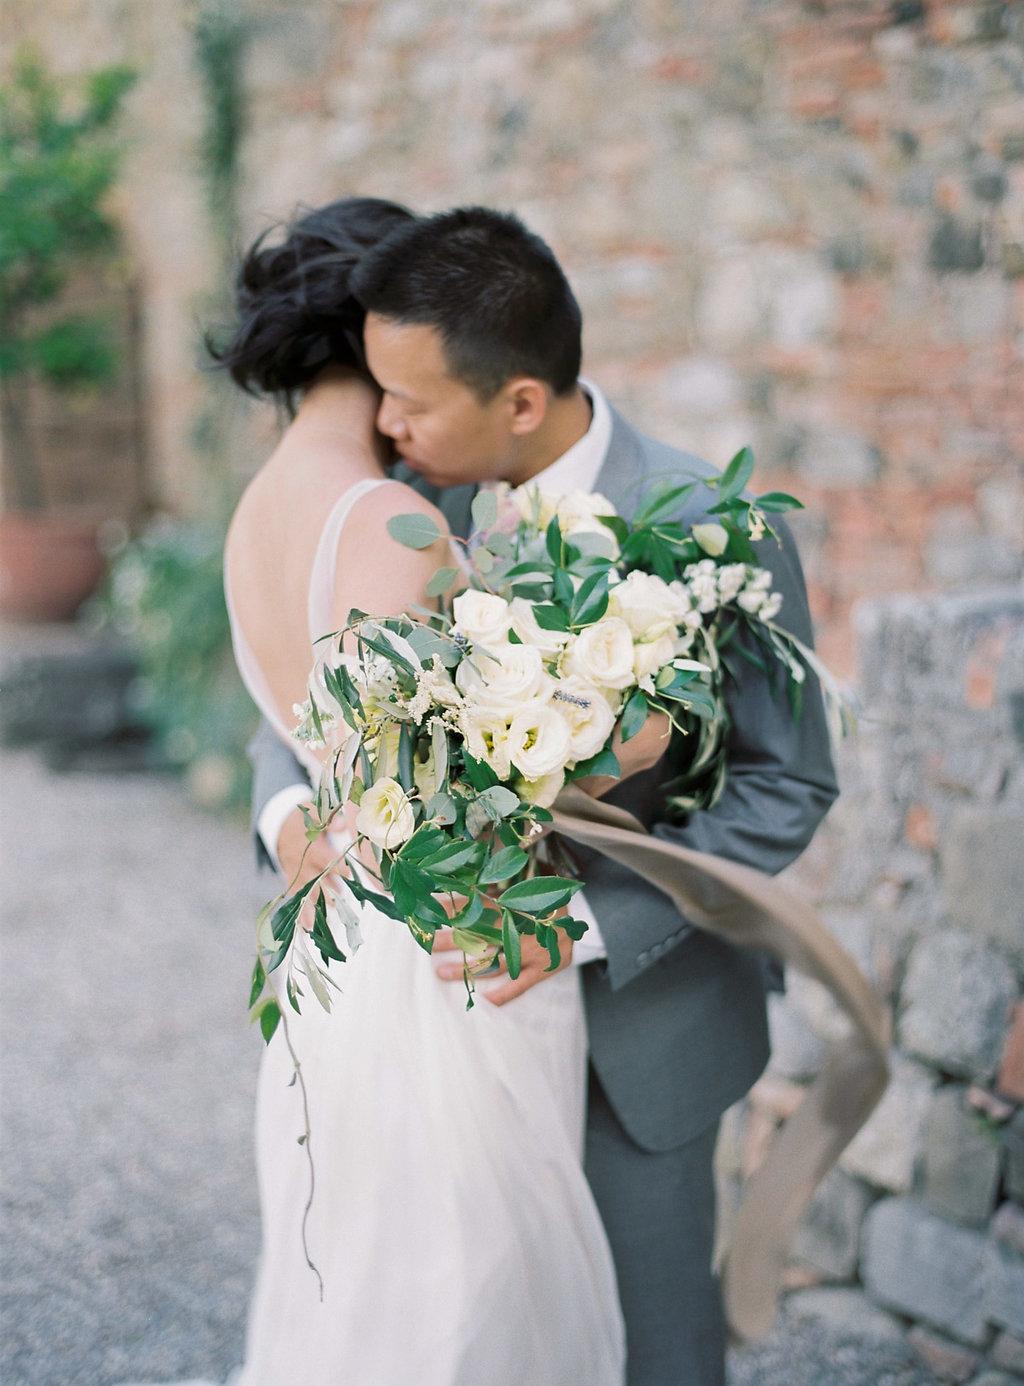 romantic wedding portraits - photo by Katie Grant Photography http://ruffledblog.com/classically-beautiful-intimate-wedding-in-tuscany